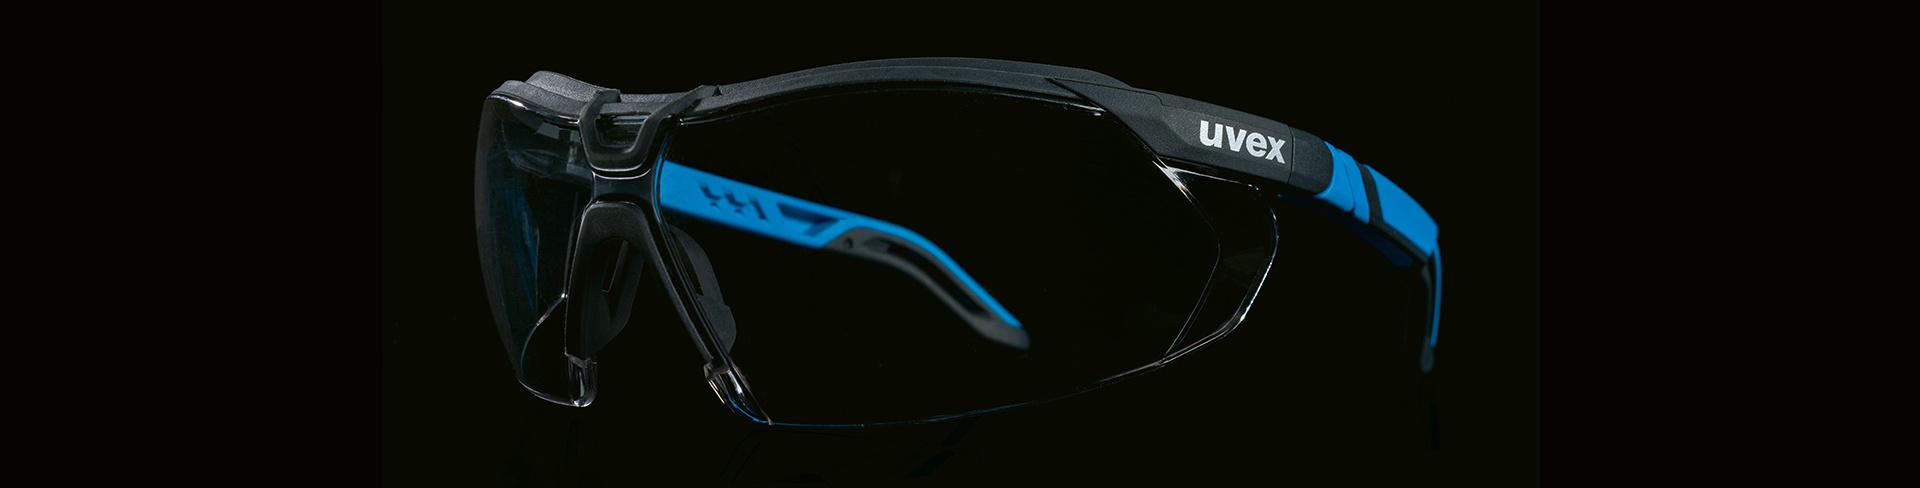 okulary uvex i-5 na czarnym tle